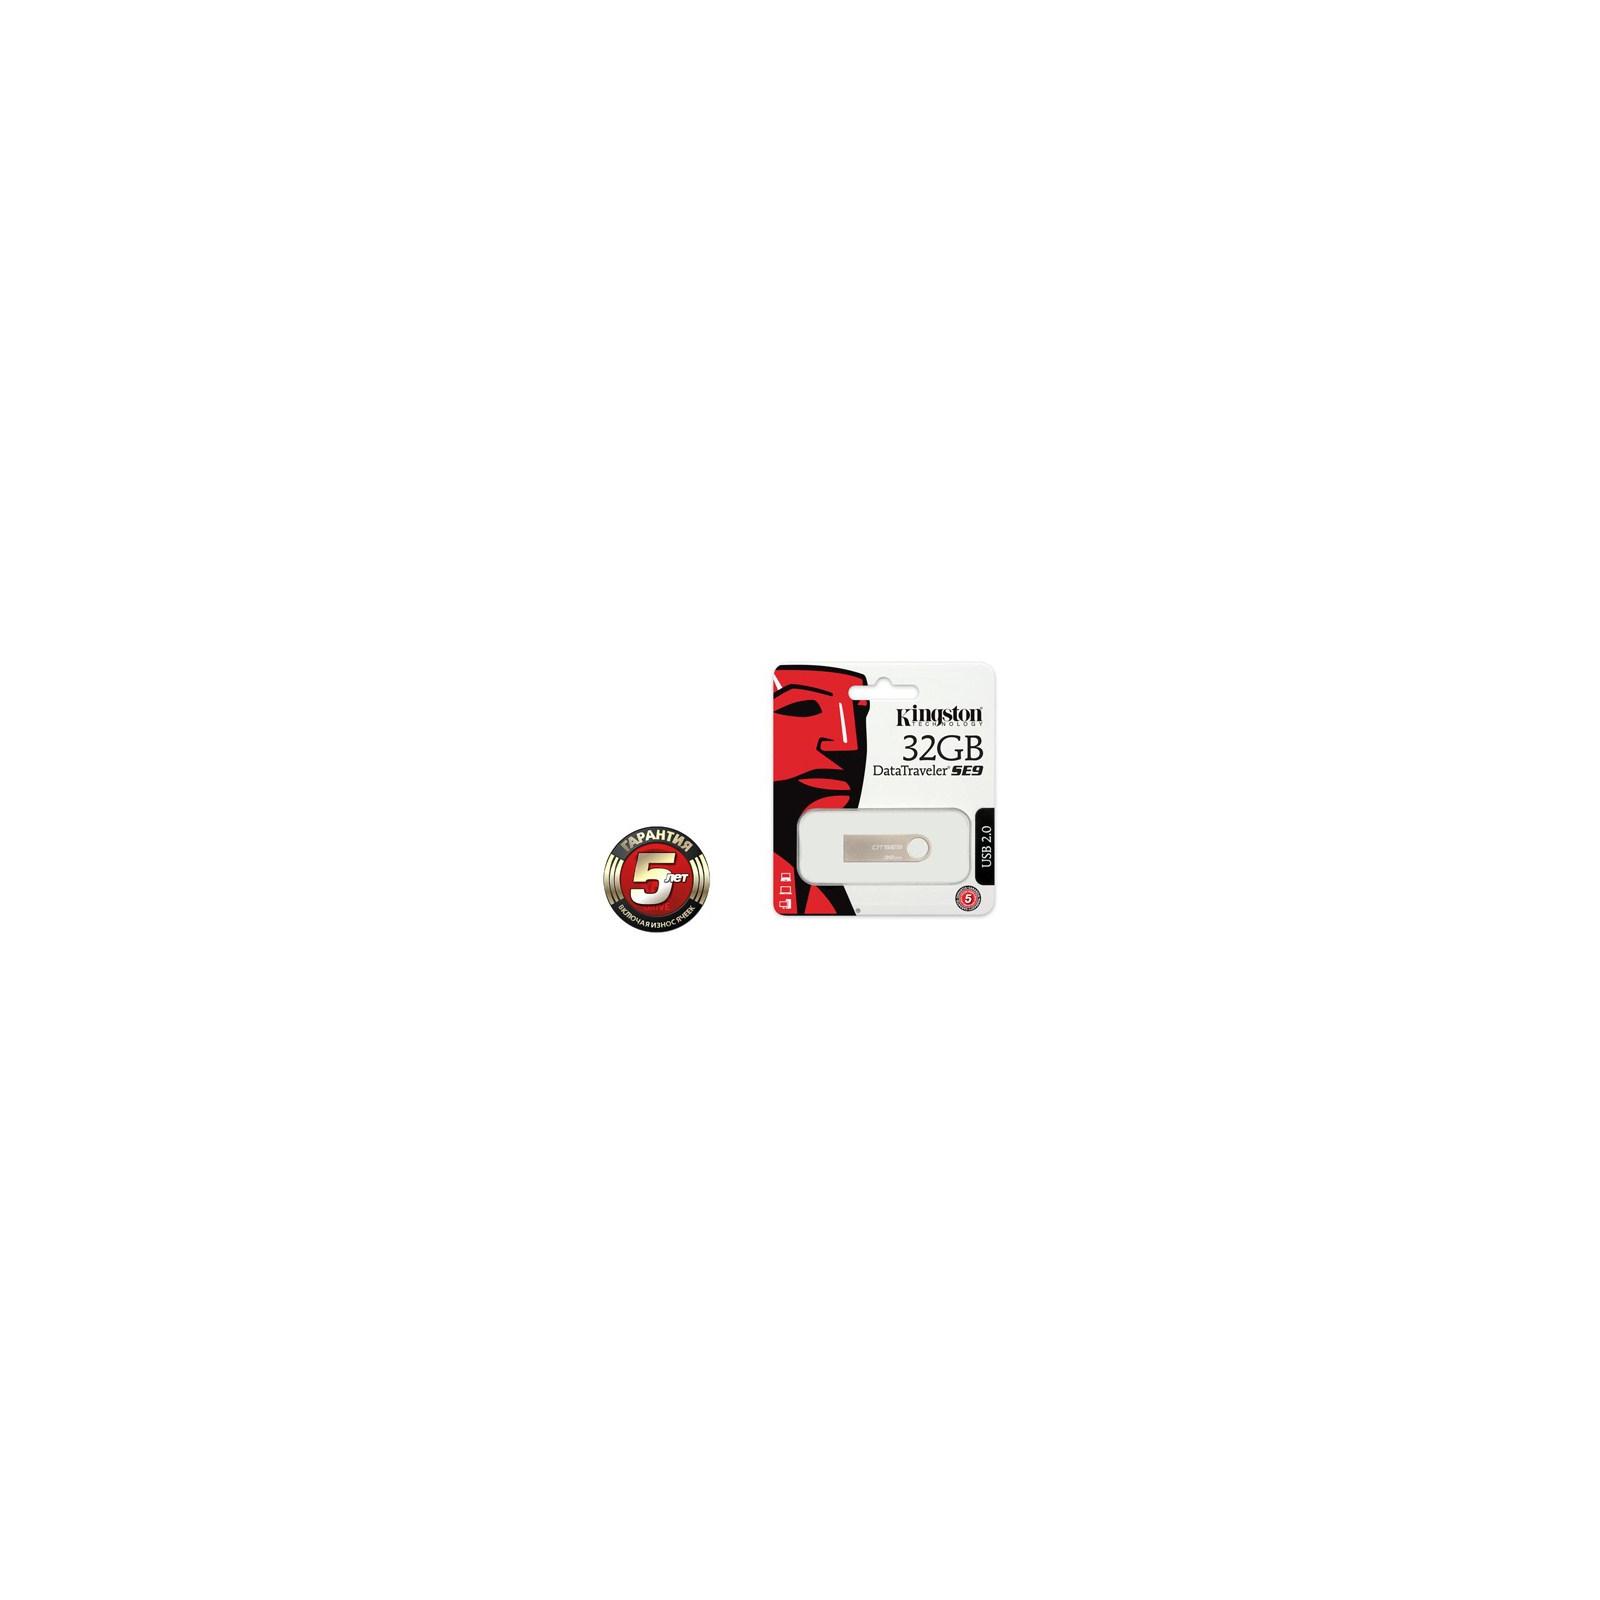 USB флеш накопитель Kingston 32Gb DataTraveler DTSE9H (DTSE9H/32GB) изображение 2